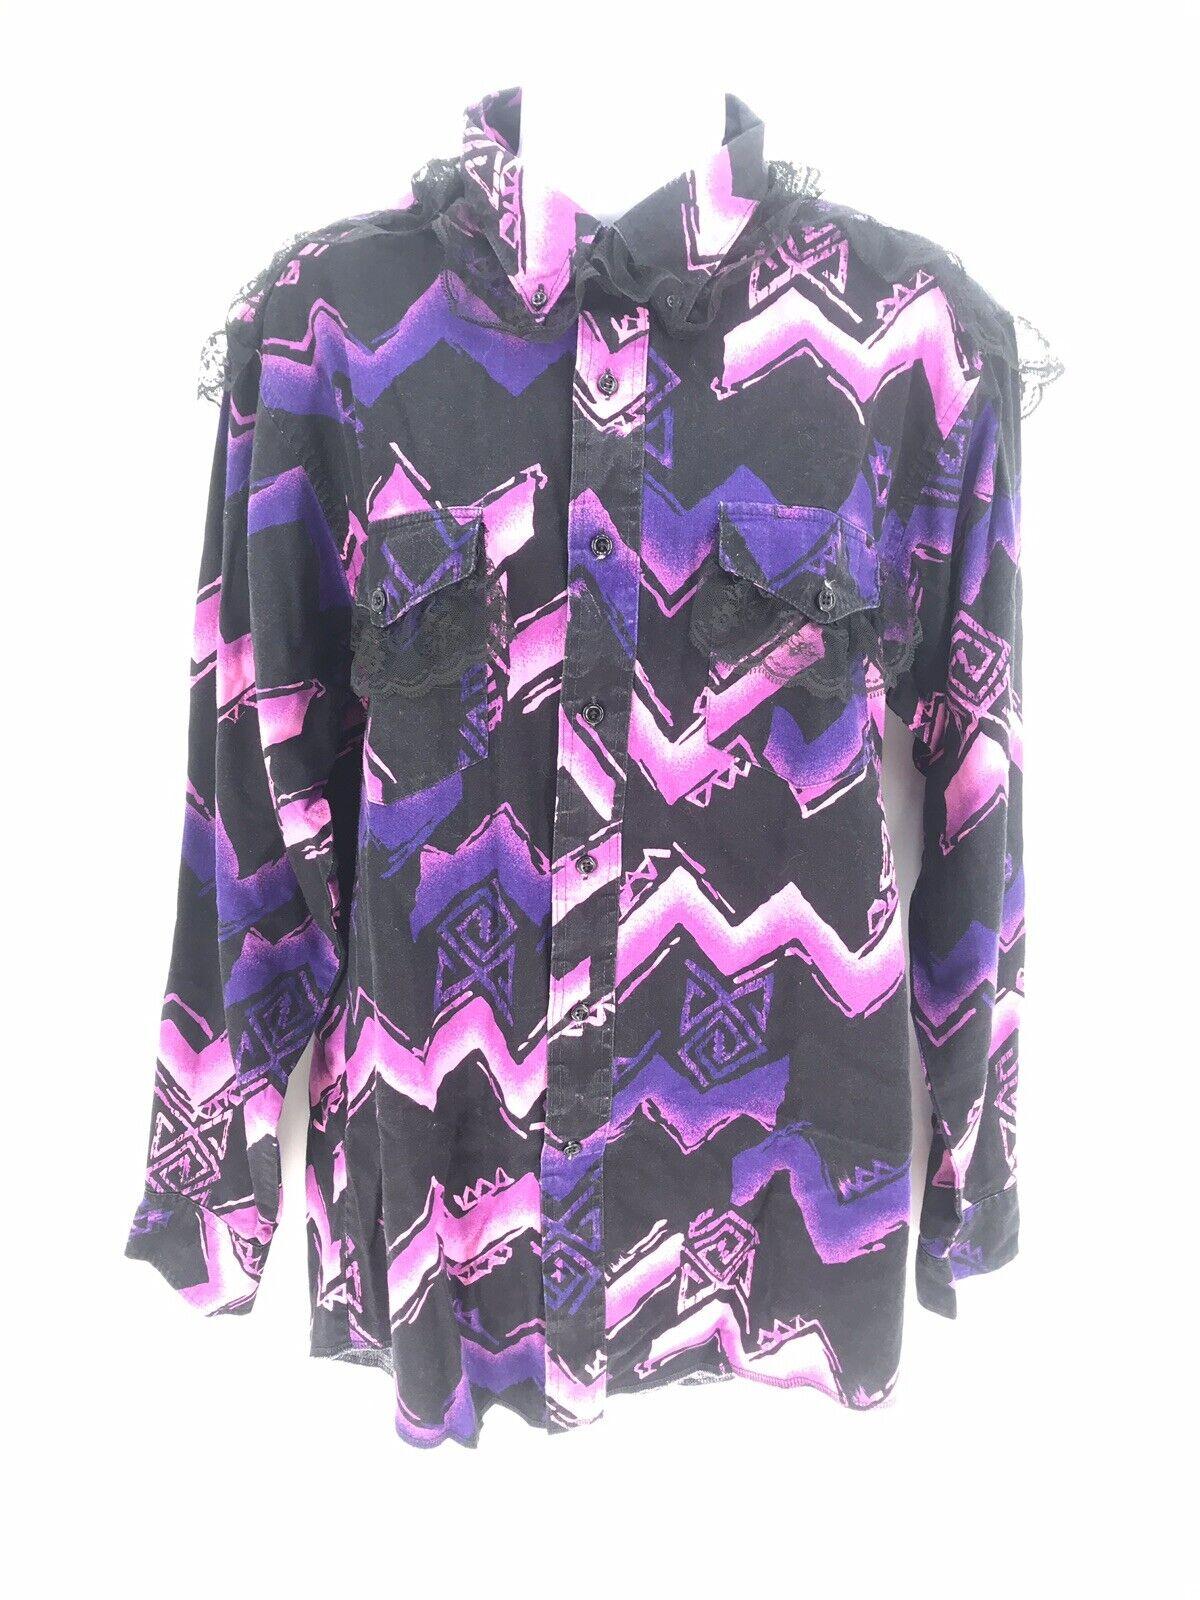 Wrangler Cowboy Cut Western Rodeo Long Sleeve Shirt Women's Large Pink W/ Lace